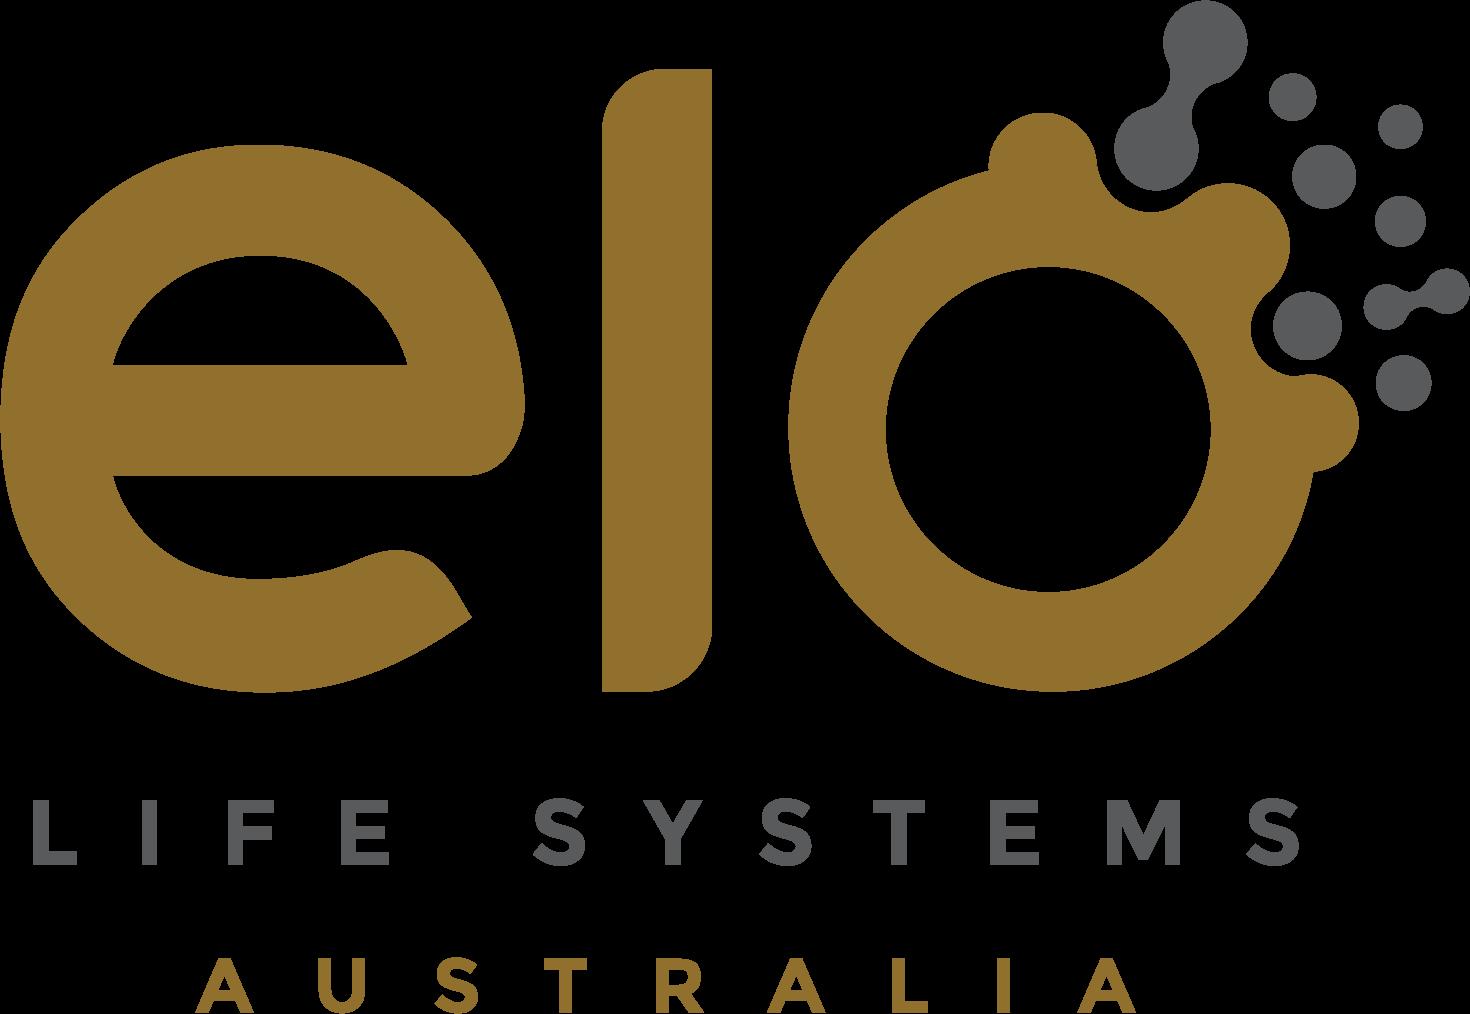 Elo Life Systems Australia